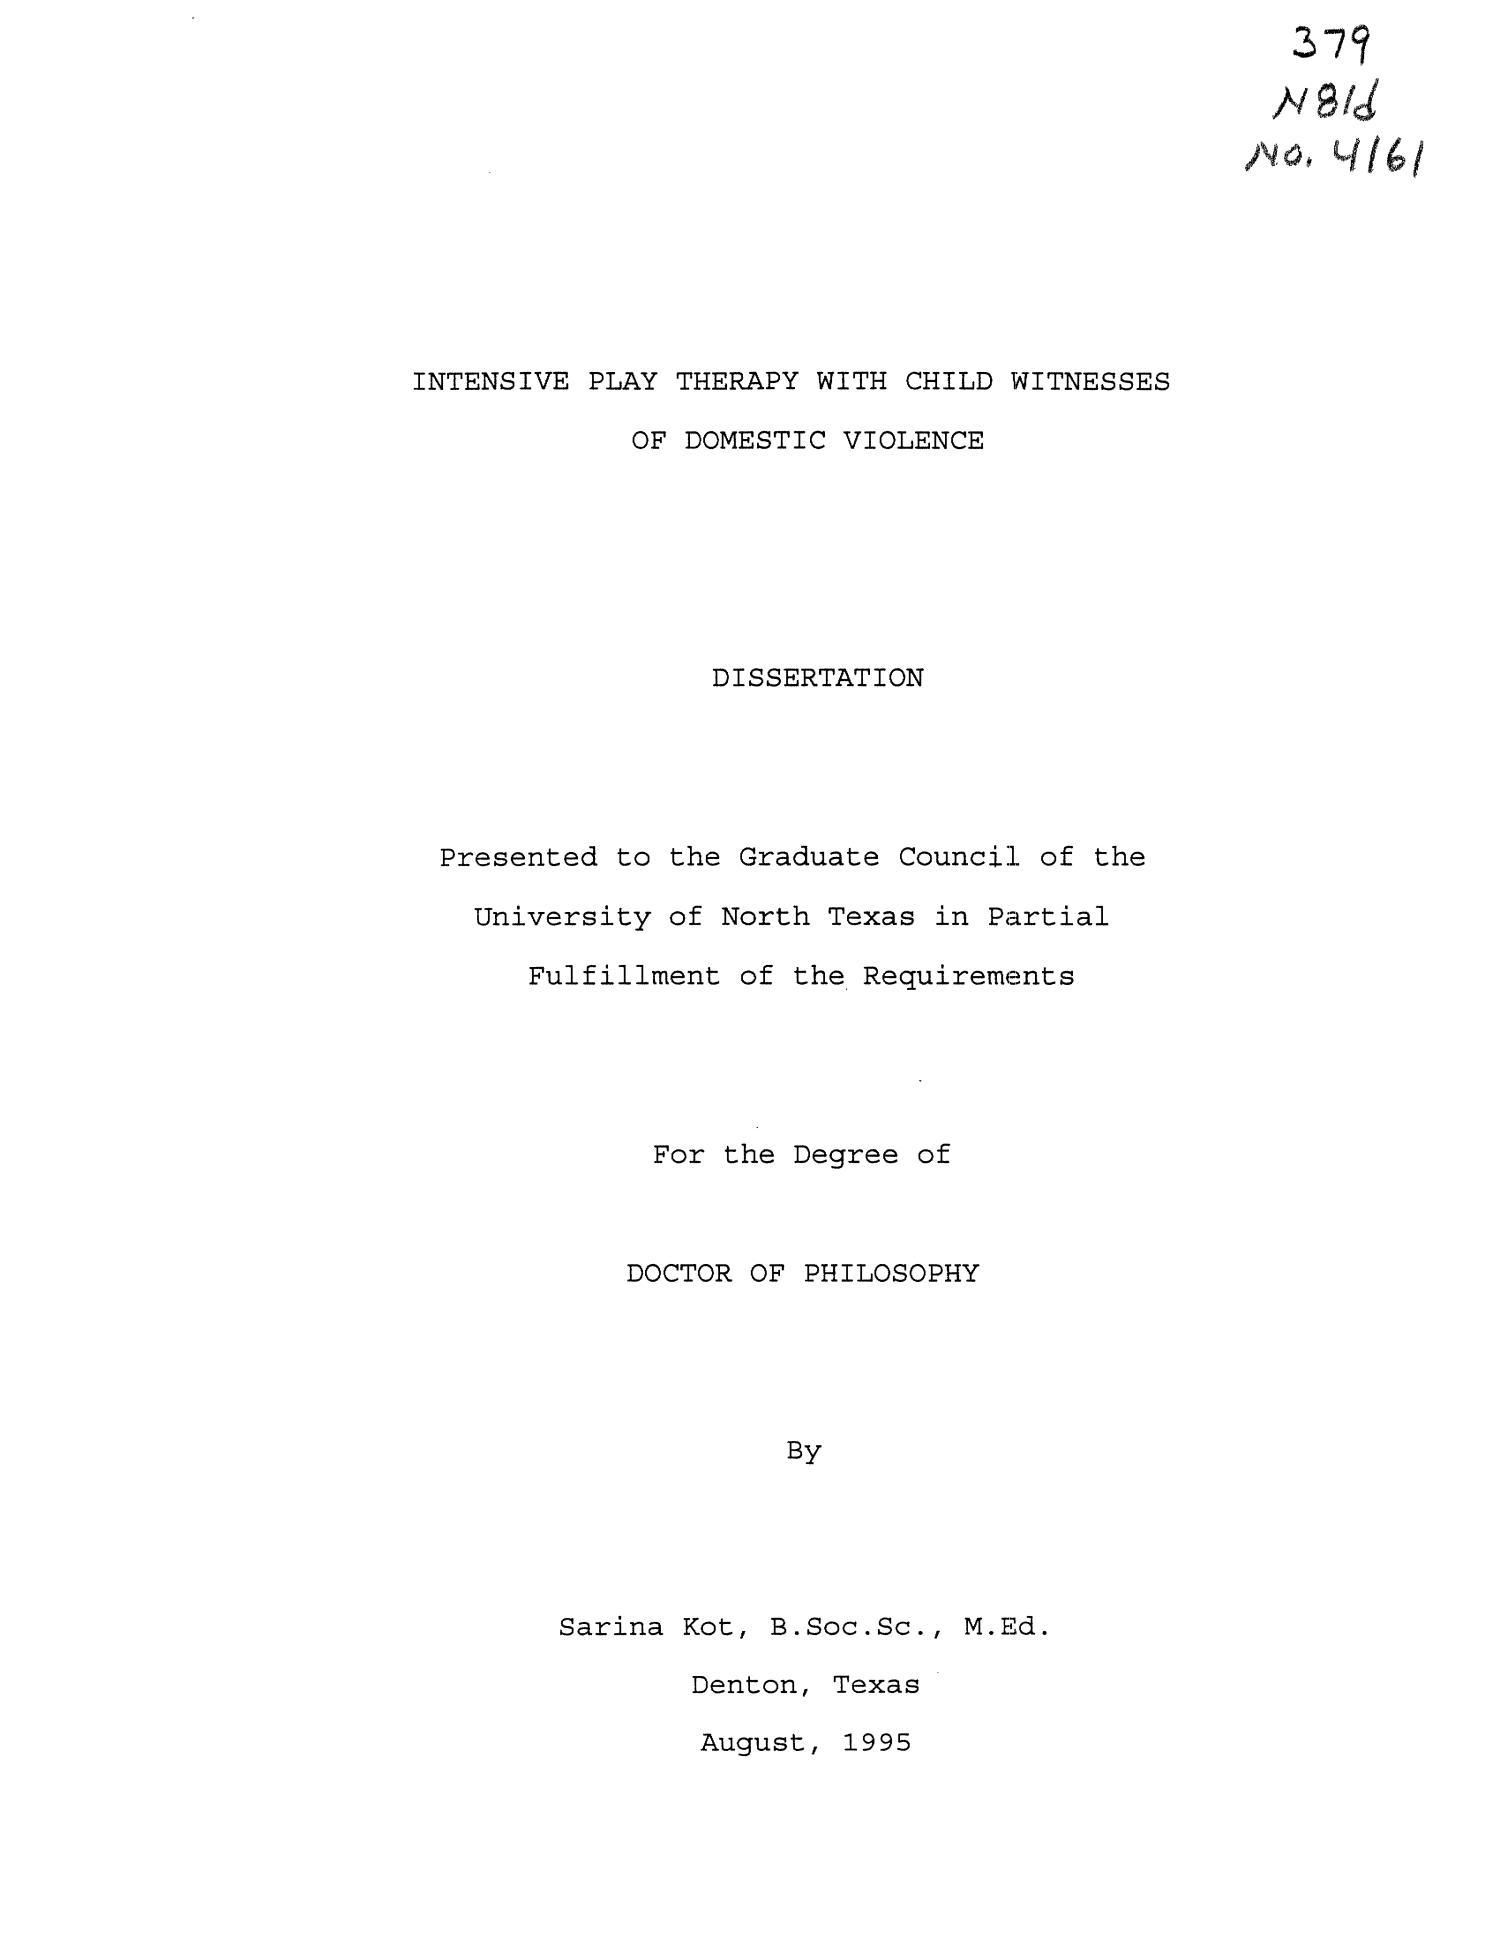 domestic violence dissertation titles